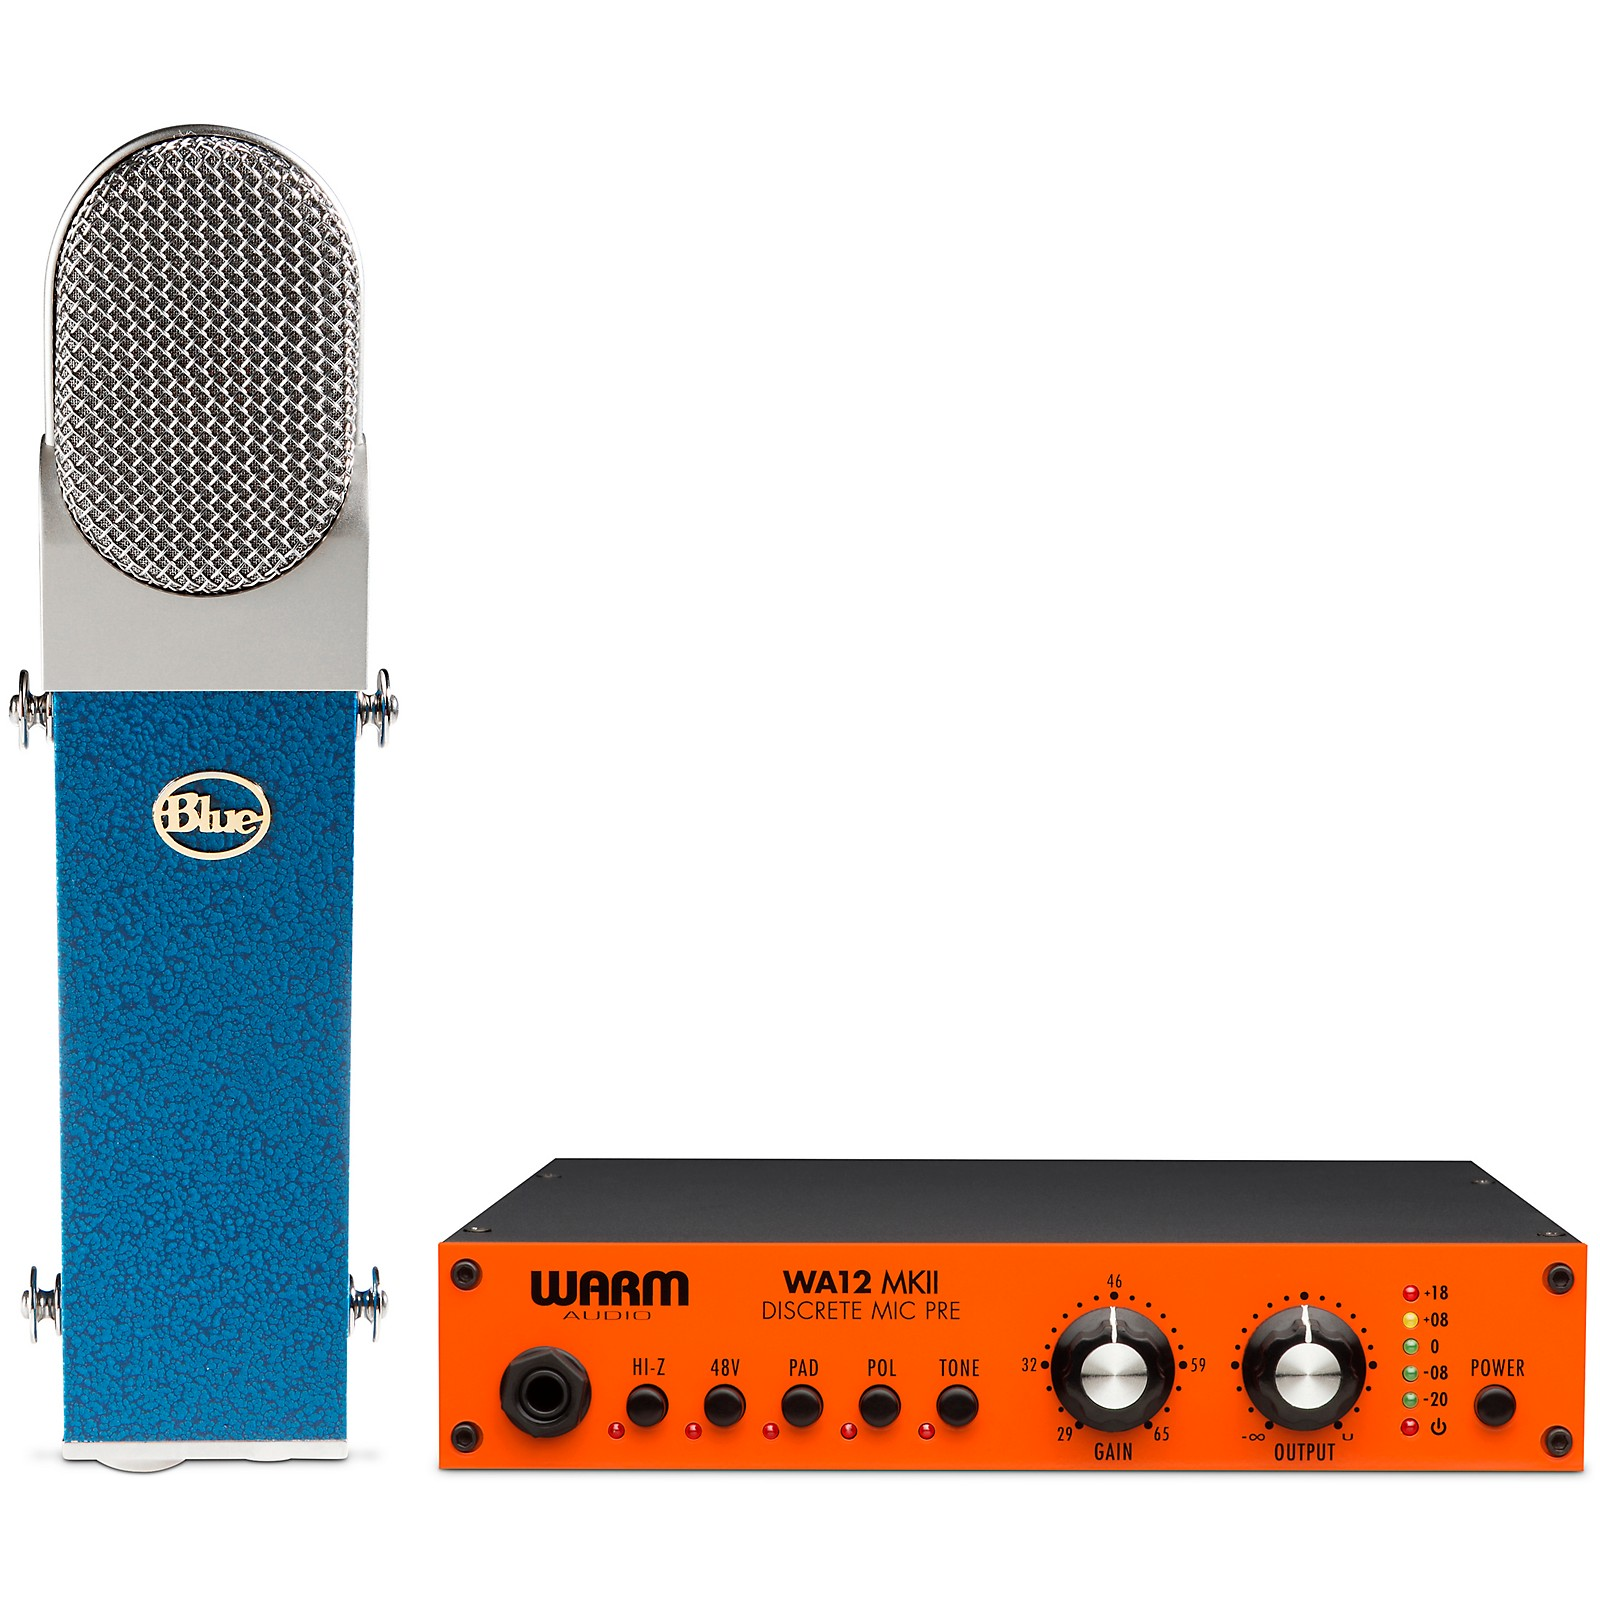 Warm Audio BLUE Blueberry Cardioid Condenser Microphone with Warm Audio WA12 MkII Microphone Preamp